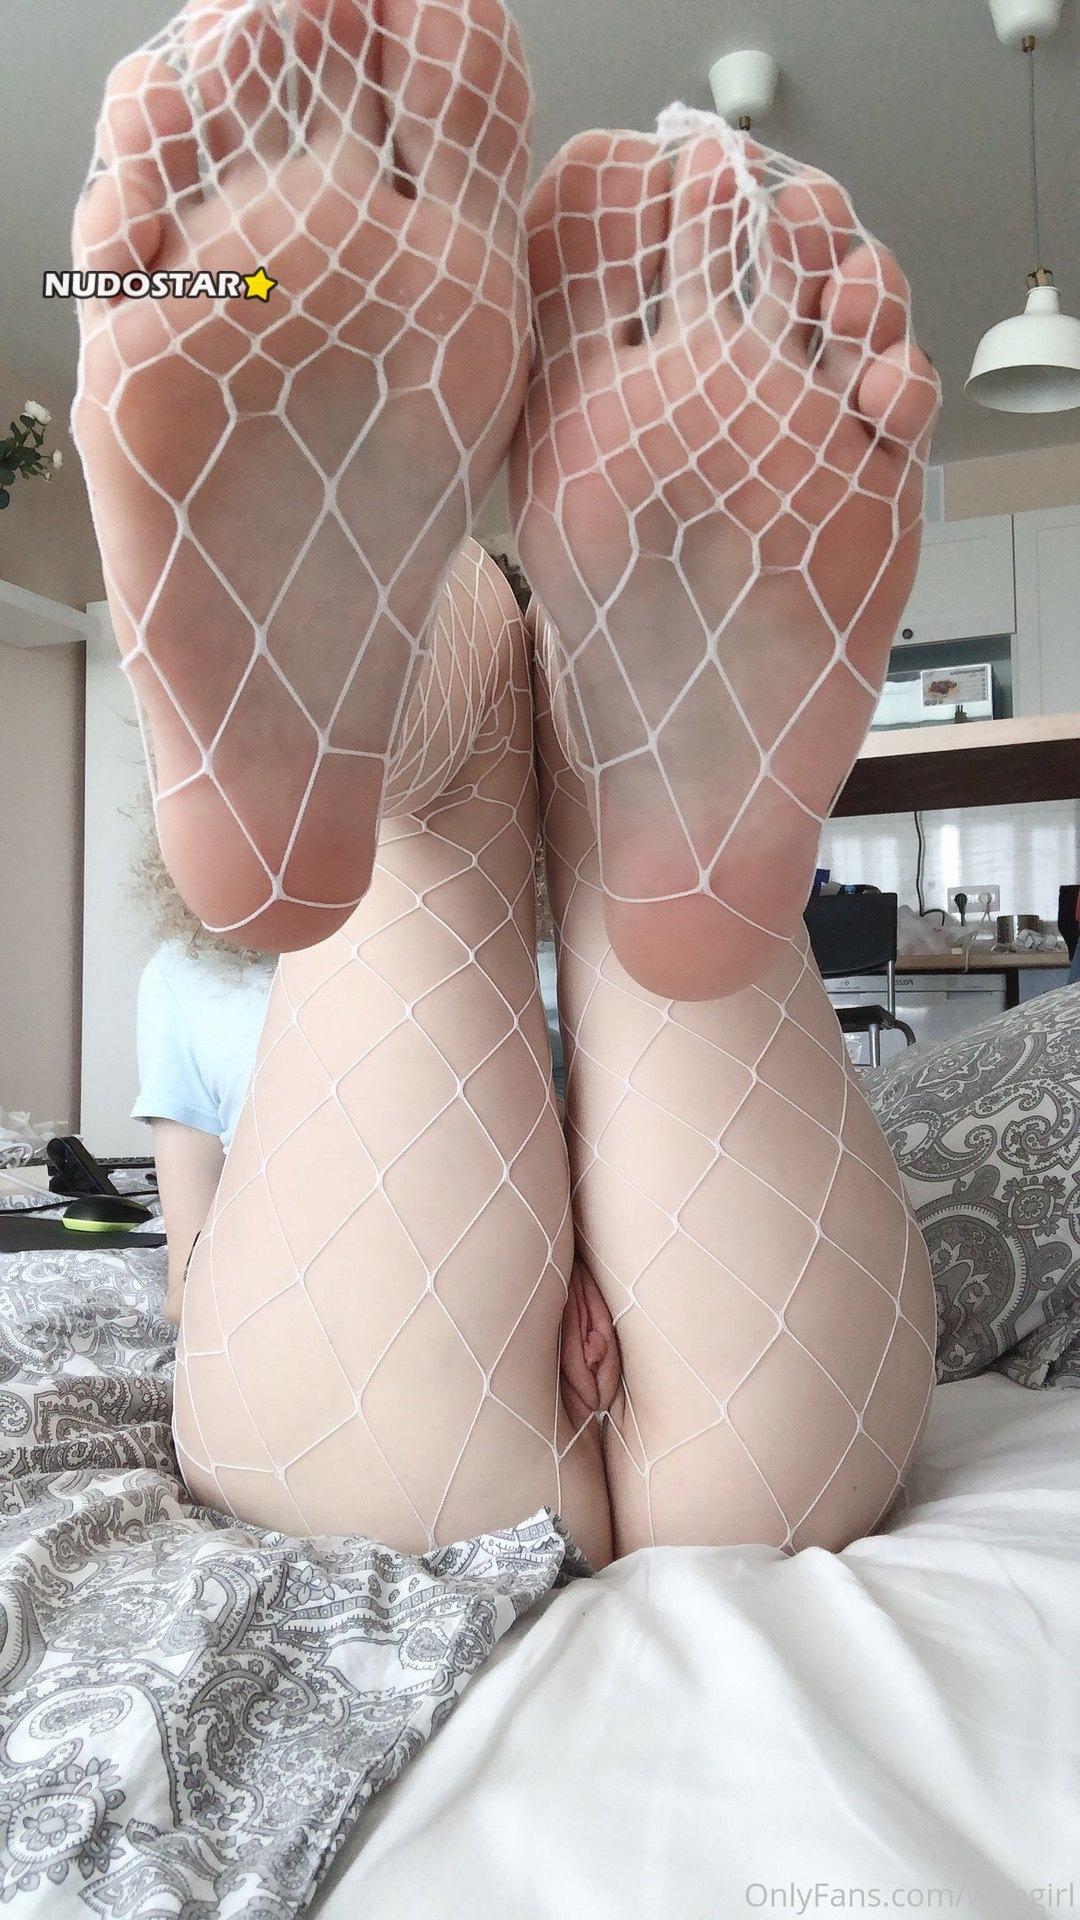 Webgirl Onlyfans Nudes Leaks 0016